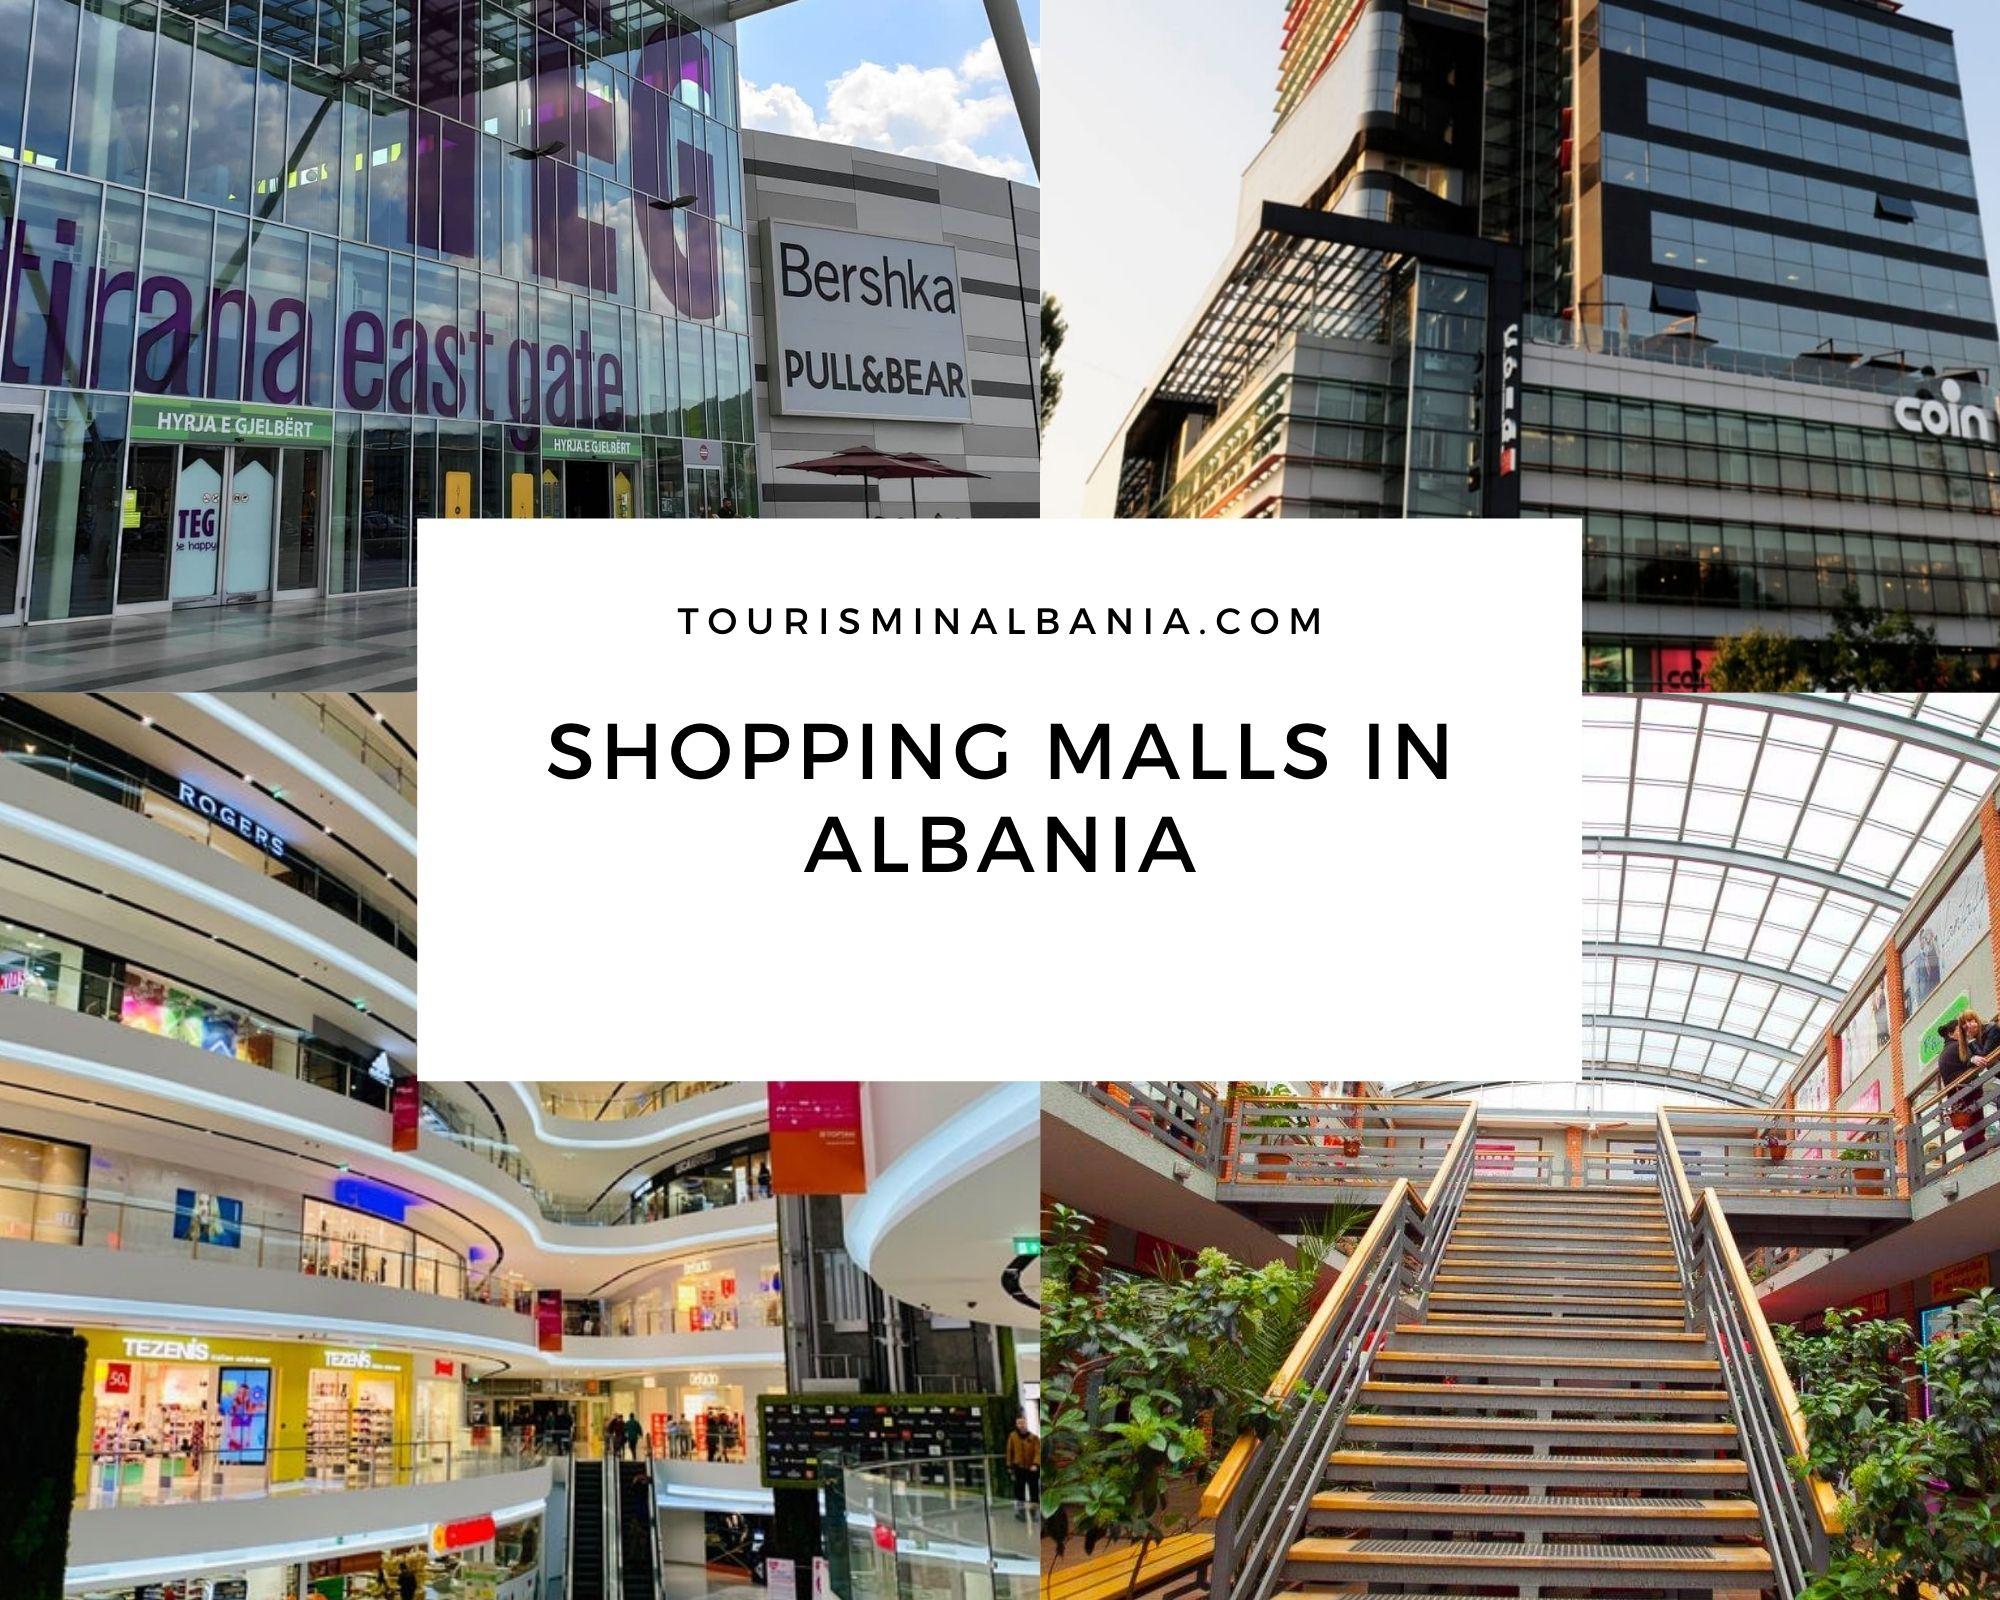 Shopping malls in Albania